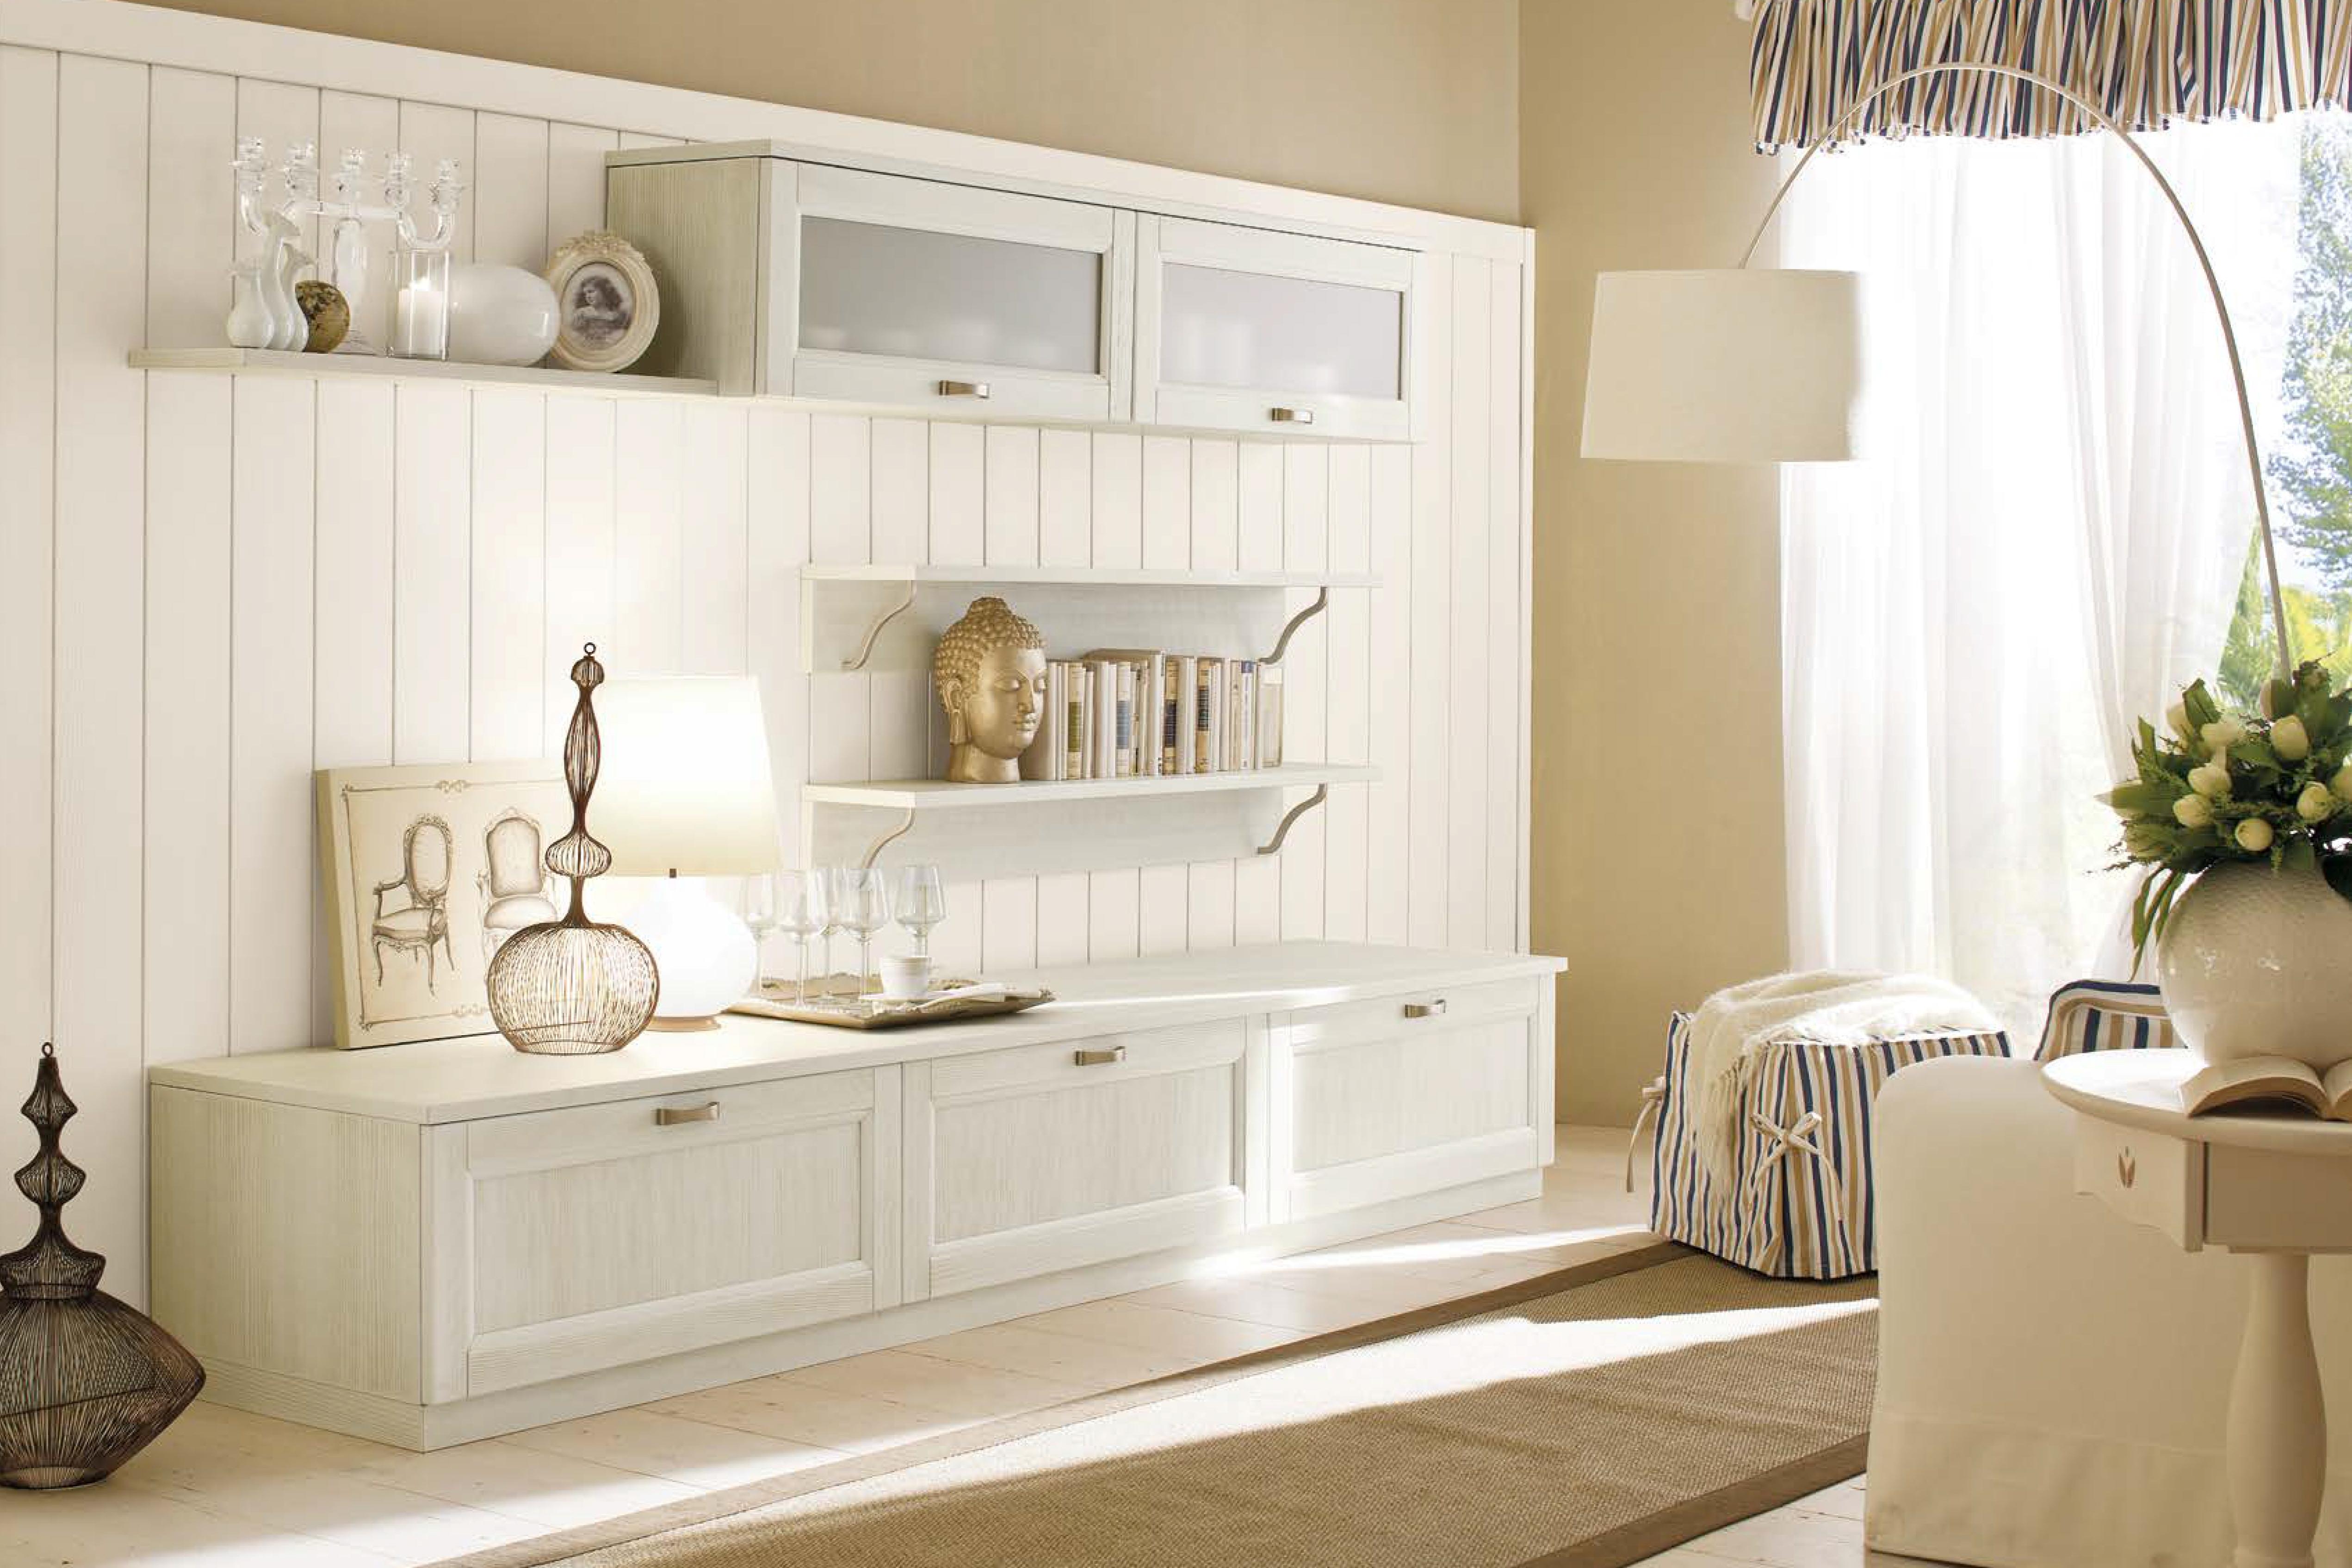 Parete attrezzata libreria living room soggiorno 4a arreda for Parete attrezzata living